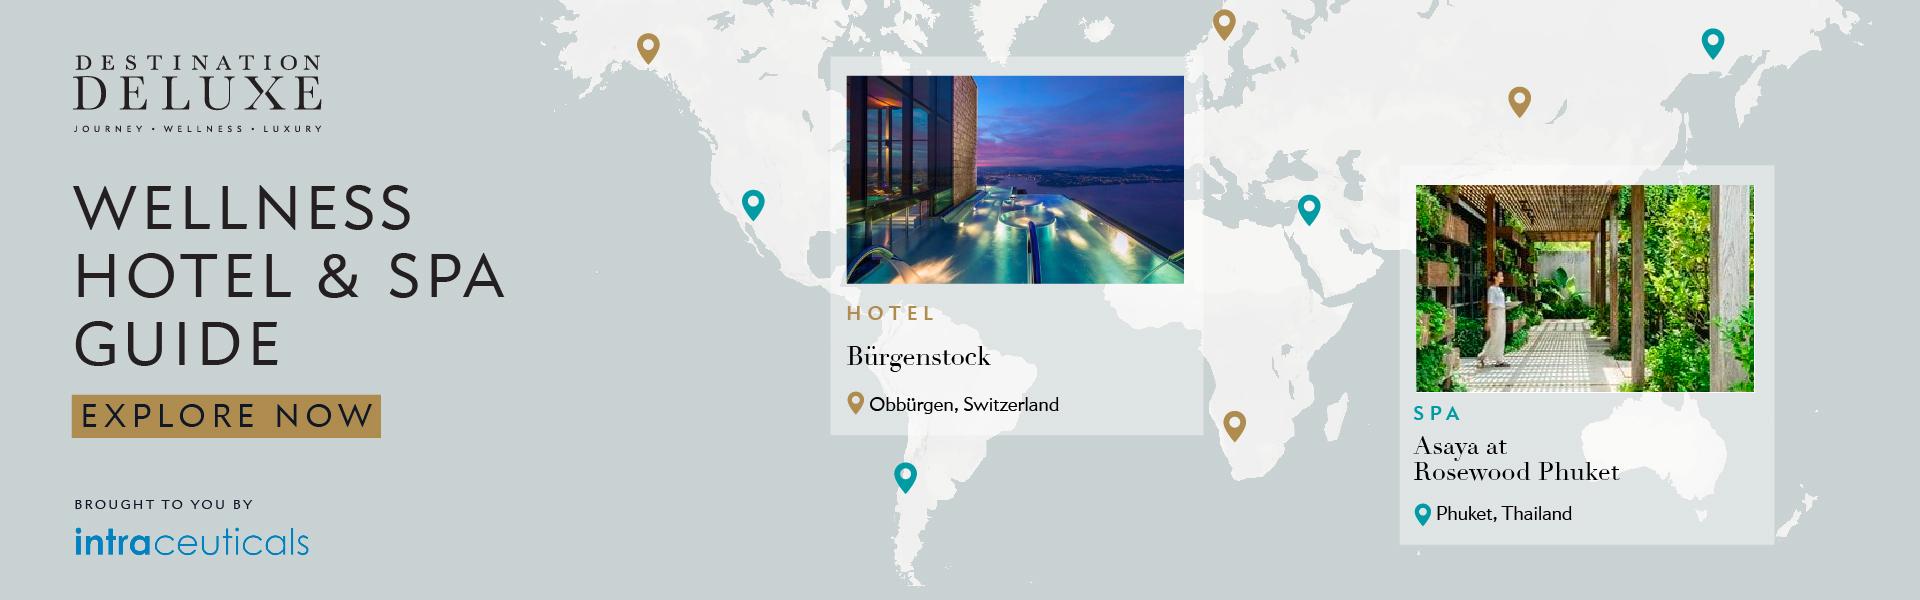 Wellness Hotel & Spa Guide Destination Deluxe